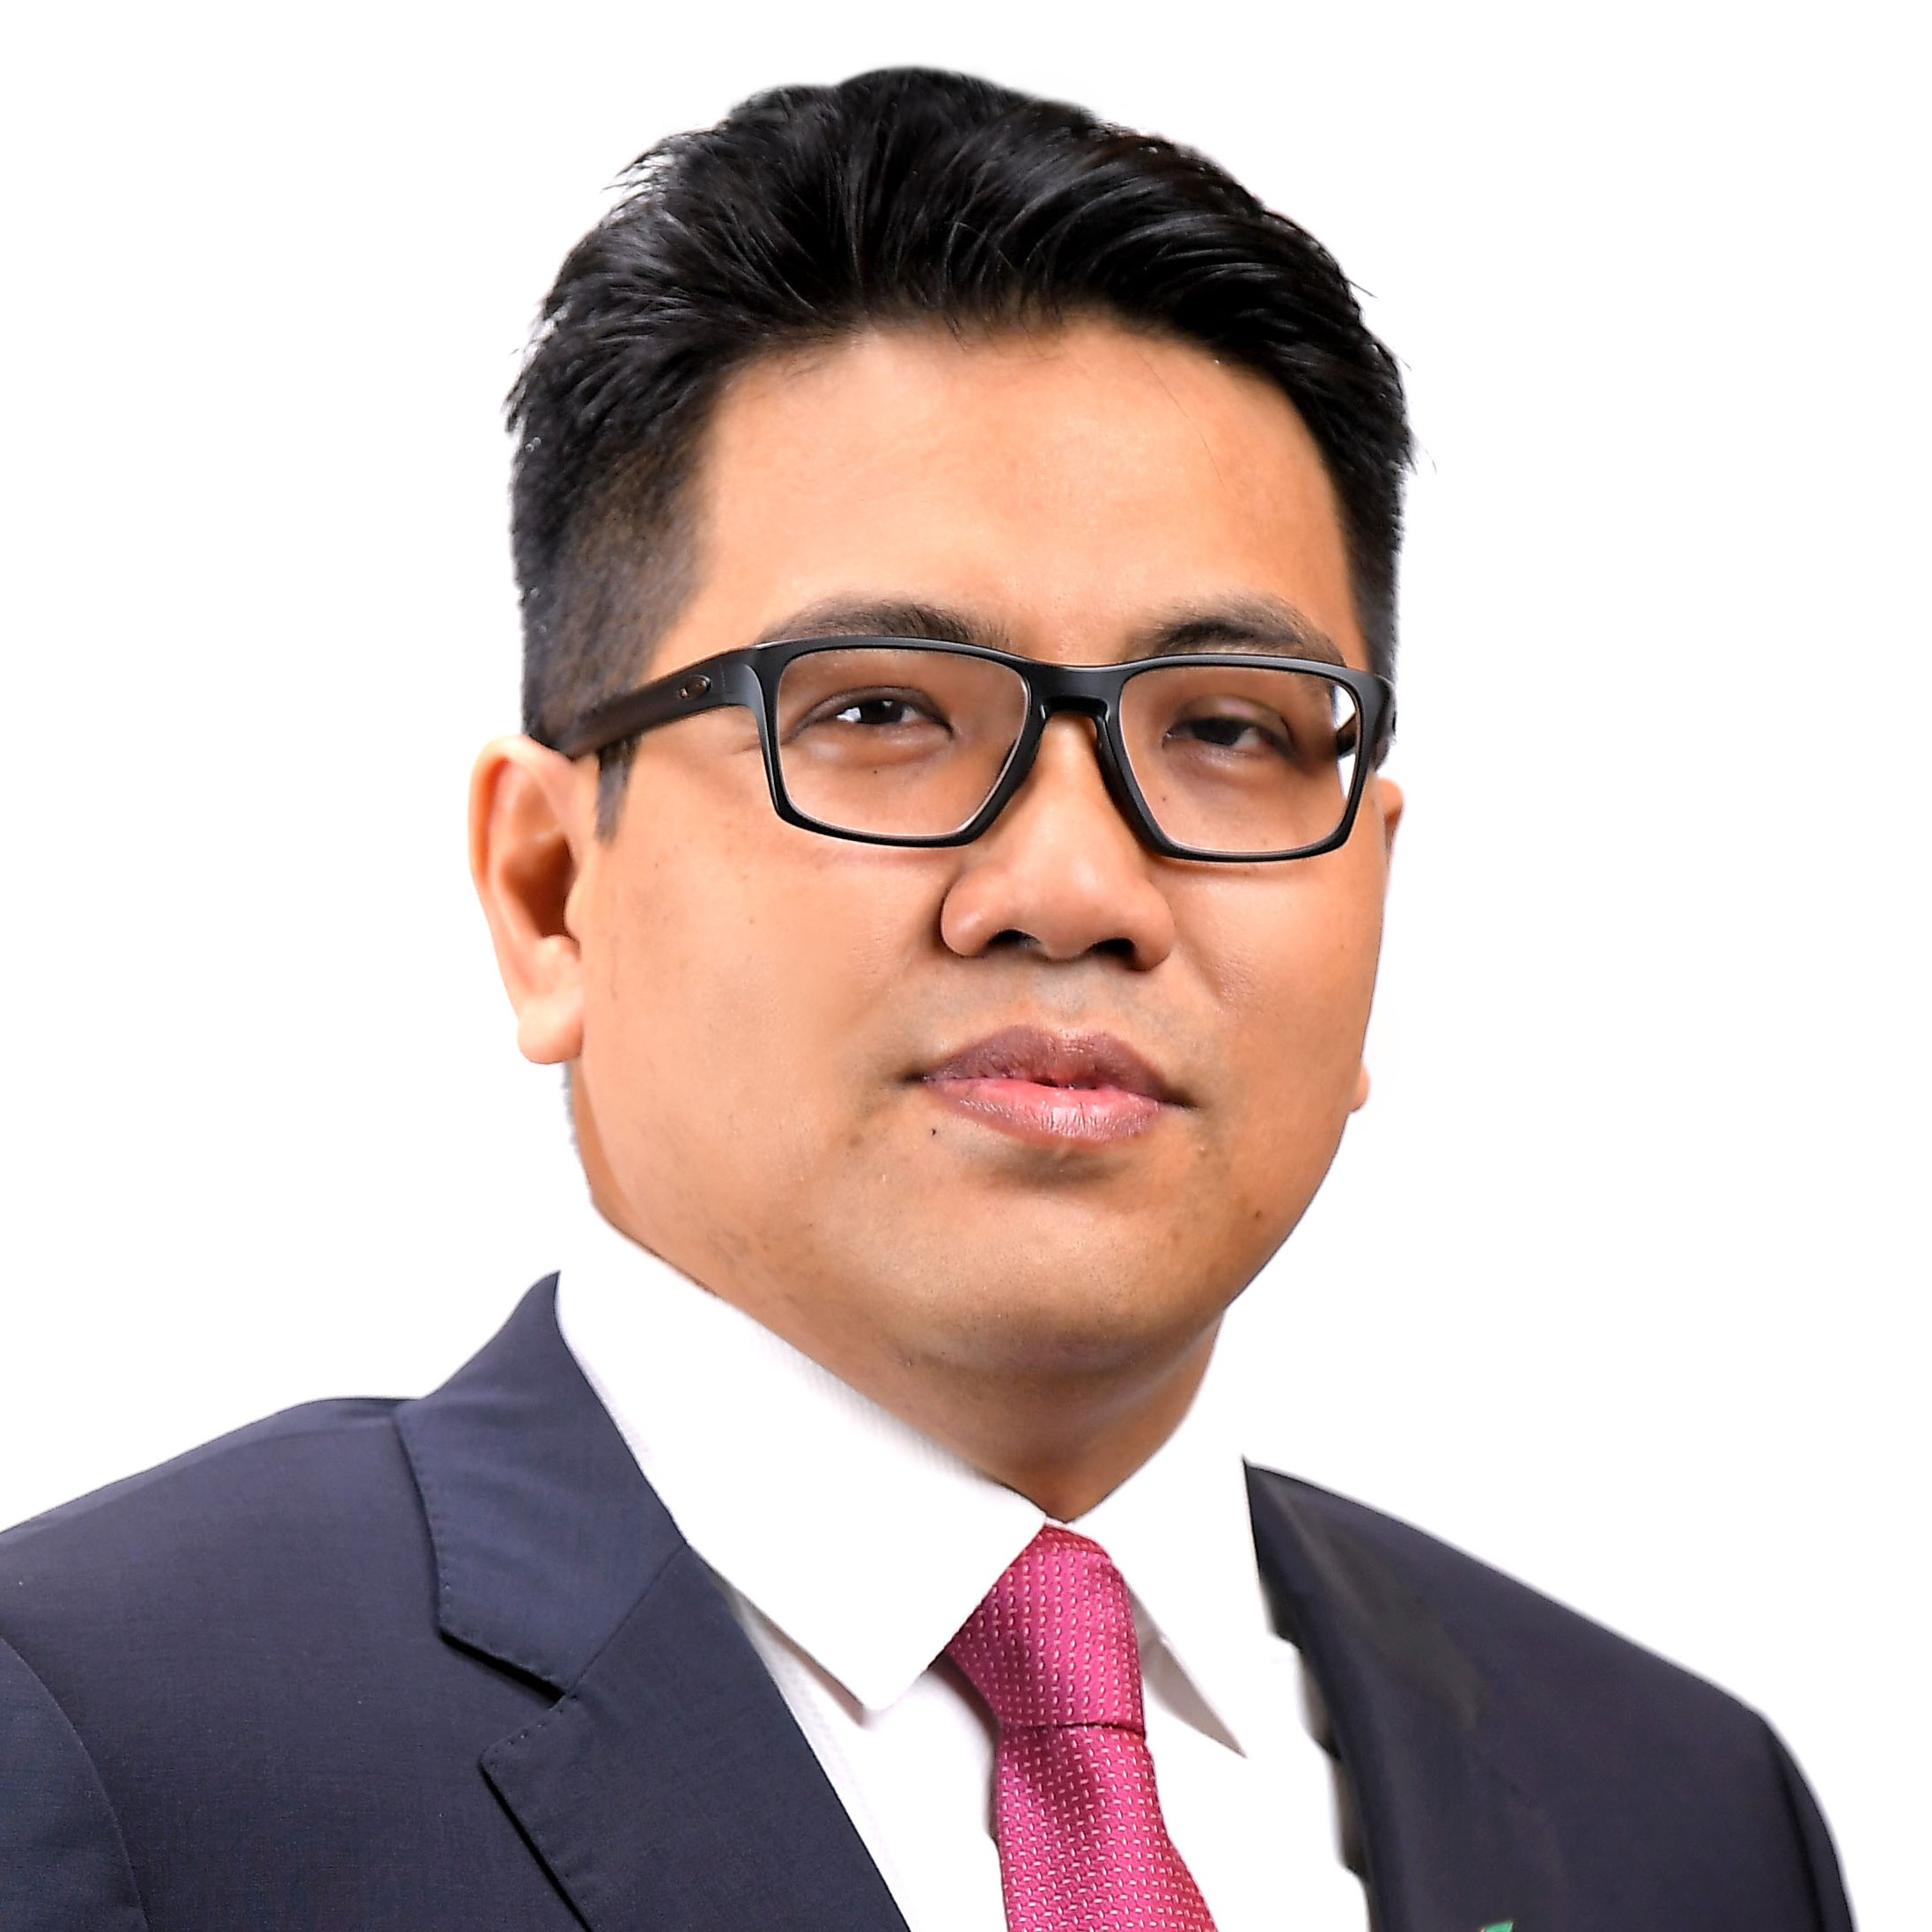 Tengku Muhammad Taufik